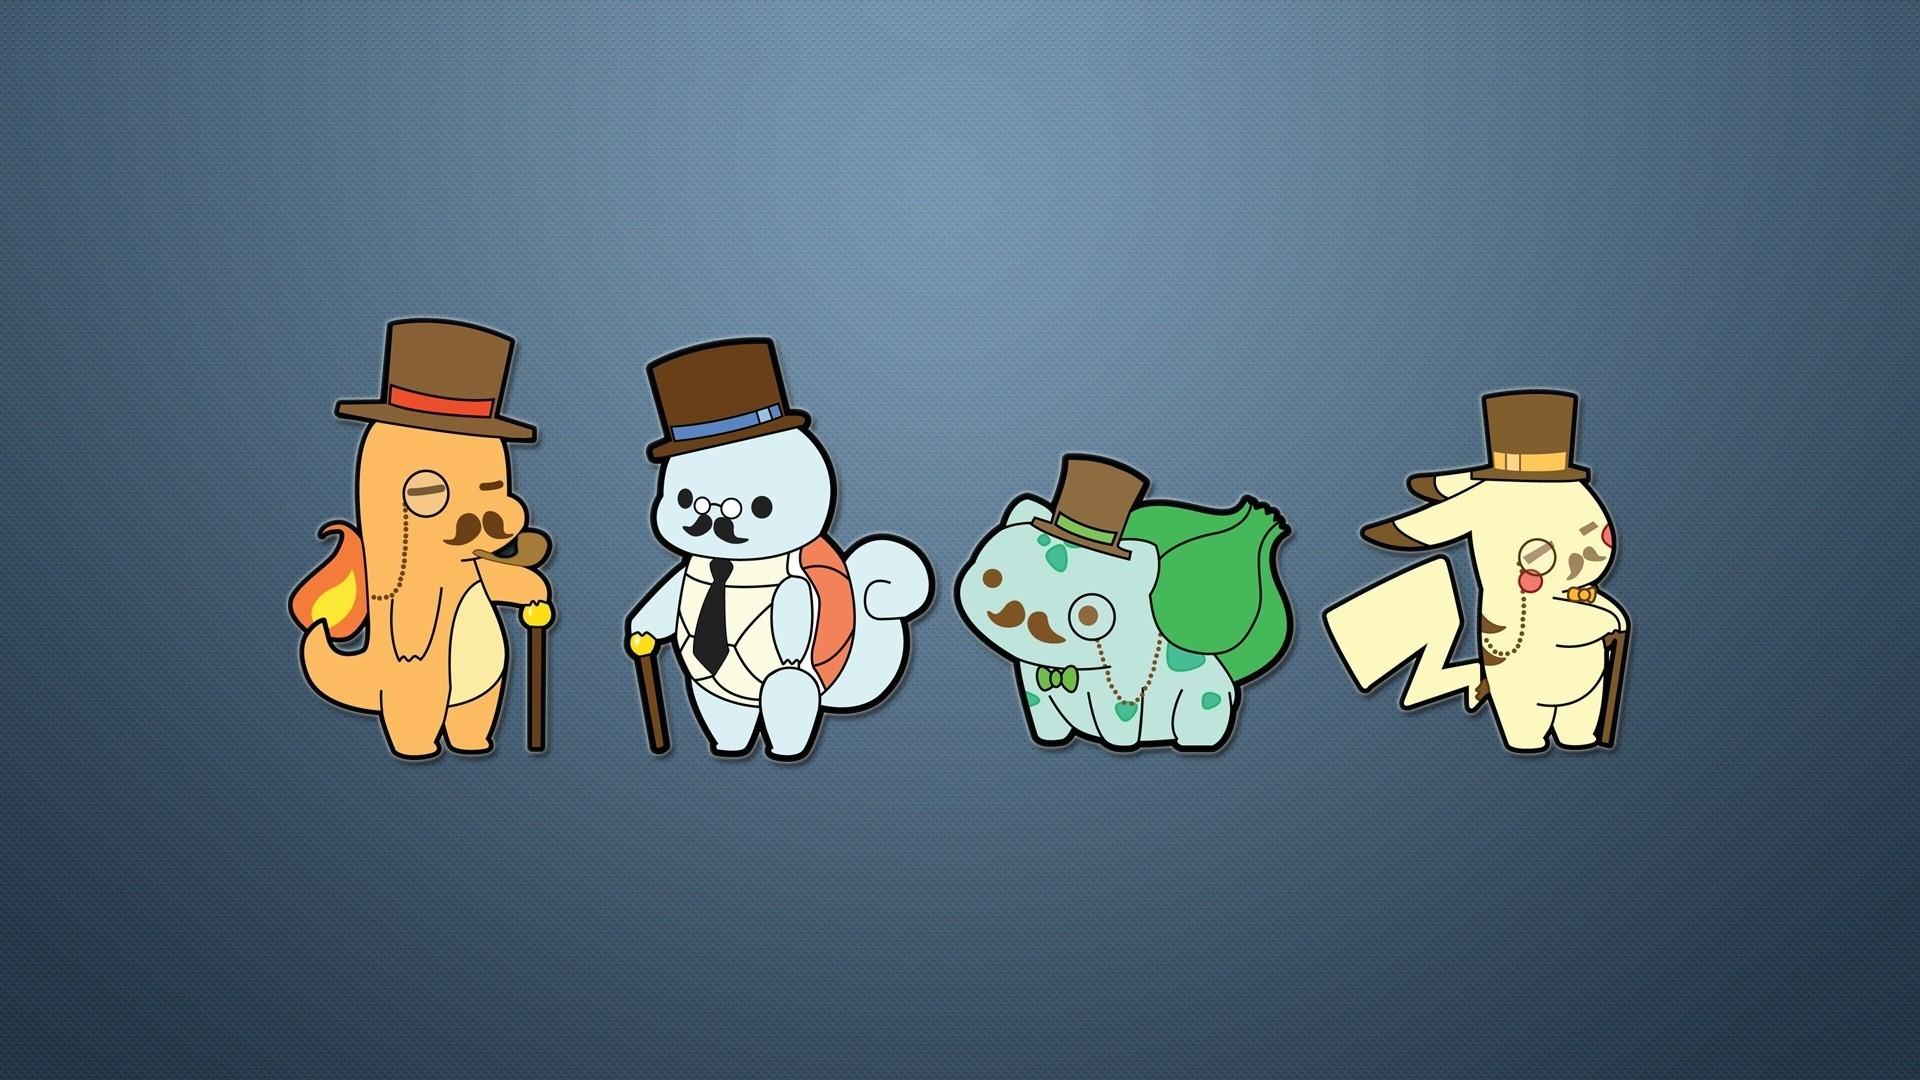 minimalism-pokemon-chermander-bulbazar-skvirtul-pikachu